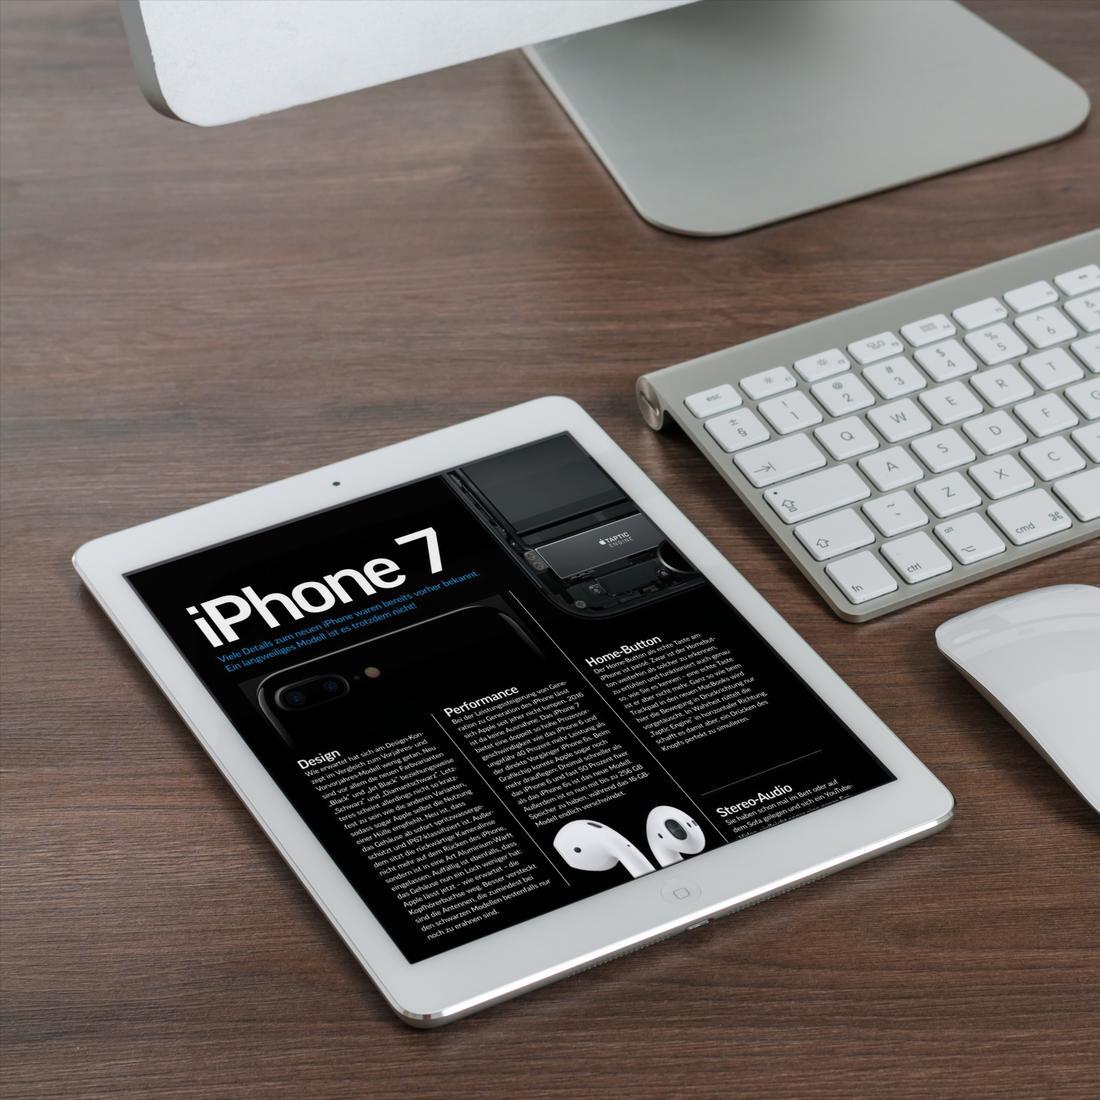 das neue iphone 7 spezial jetzt gratis in unserem pdf. Black Bedroom Furniture Sets. Home Design Ideas